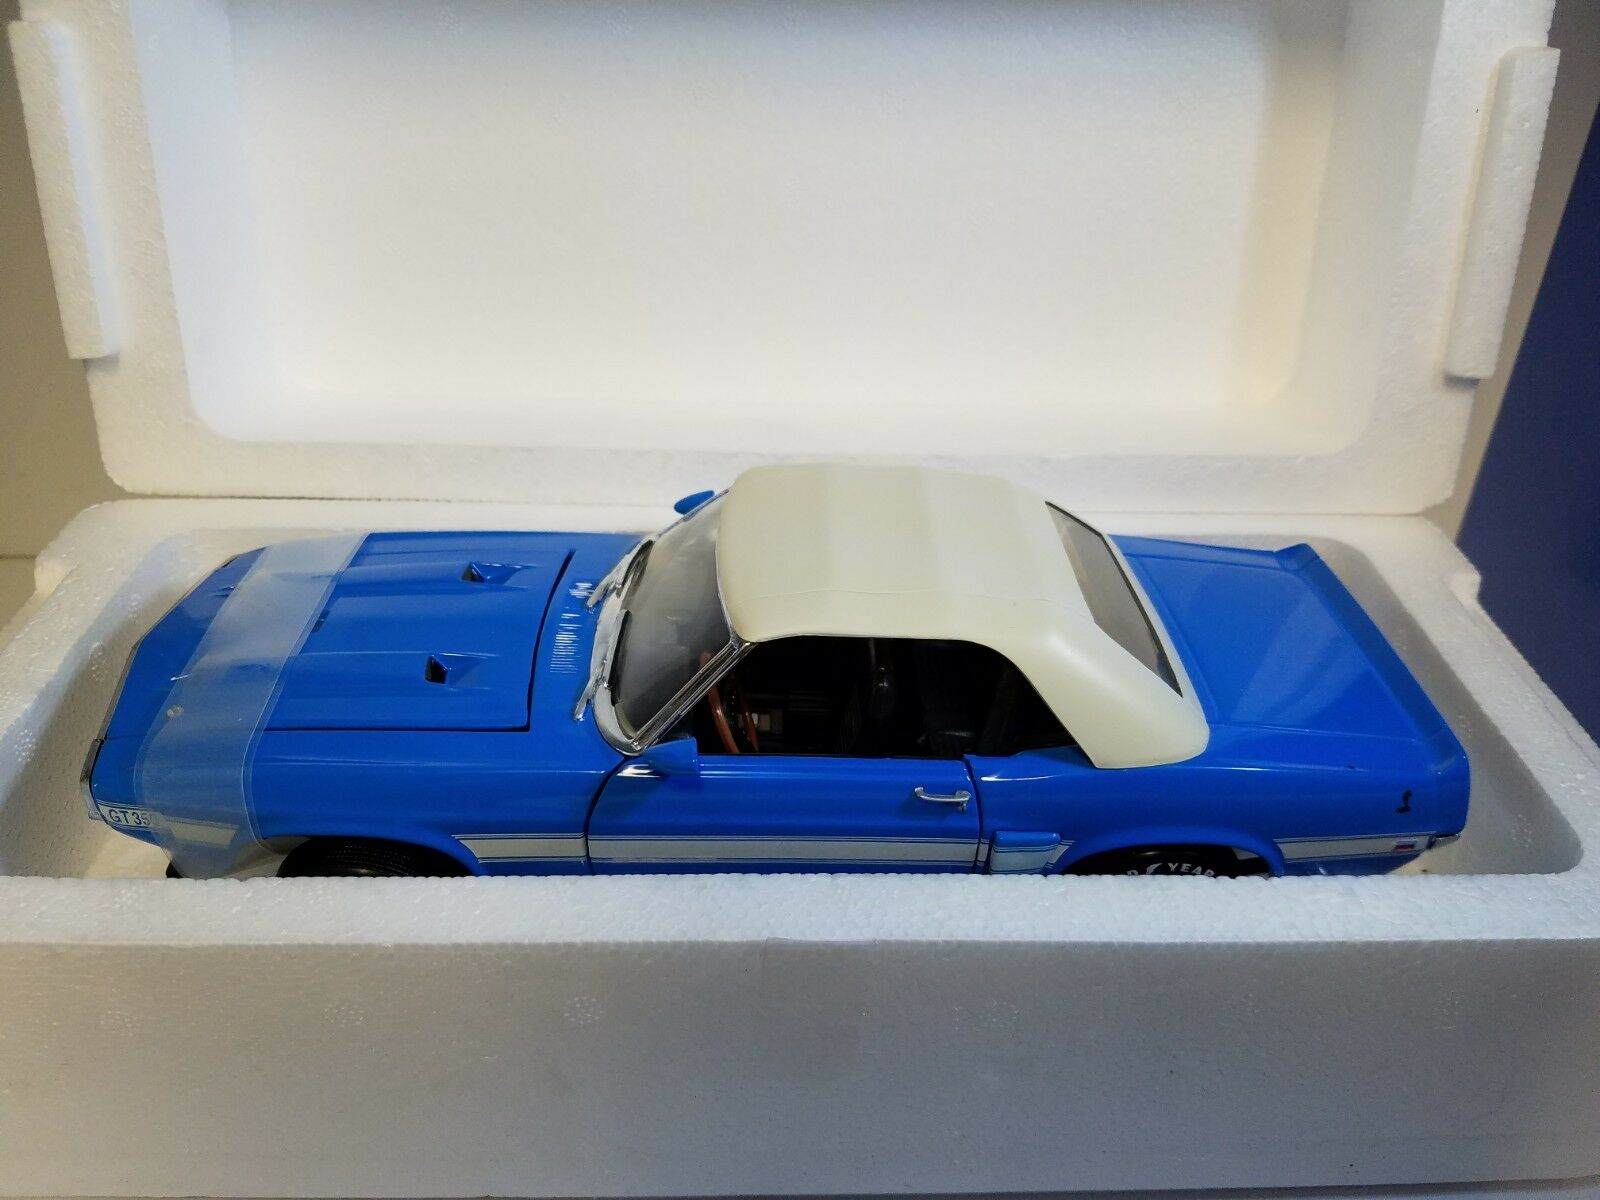 1/18 Ertl American Muscle Menta 2018 Shelby Cobra GT-350 Azul